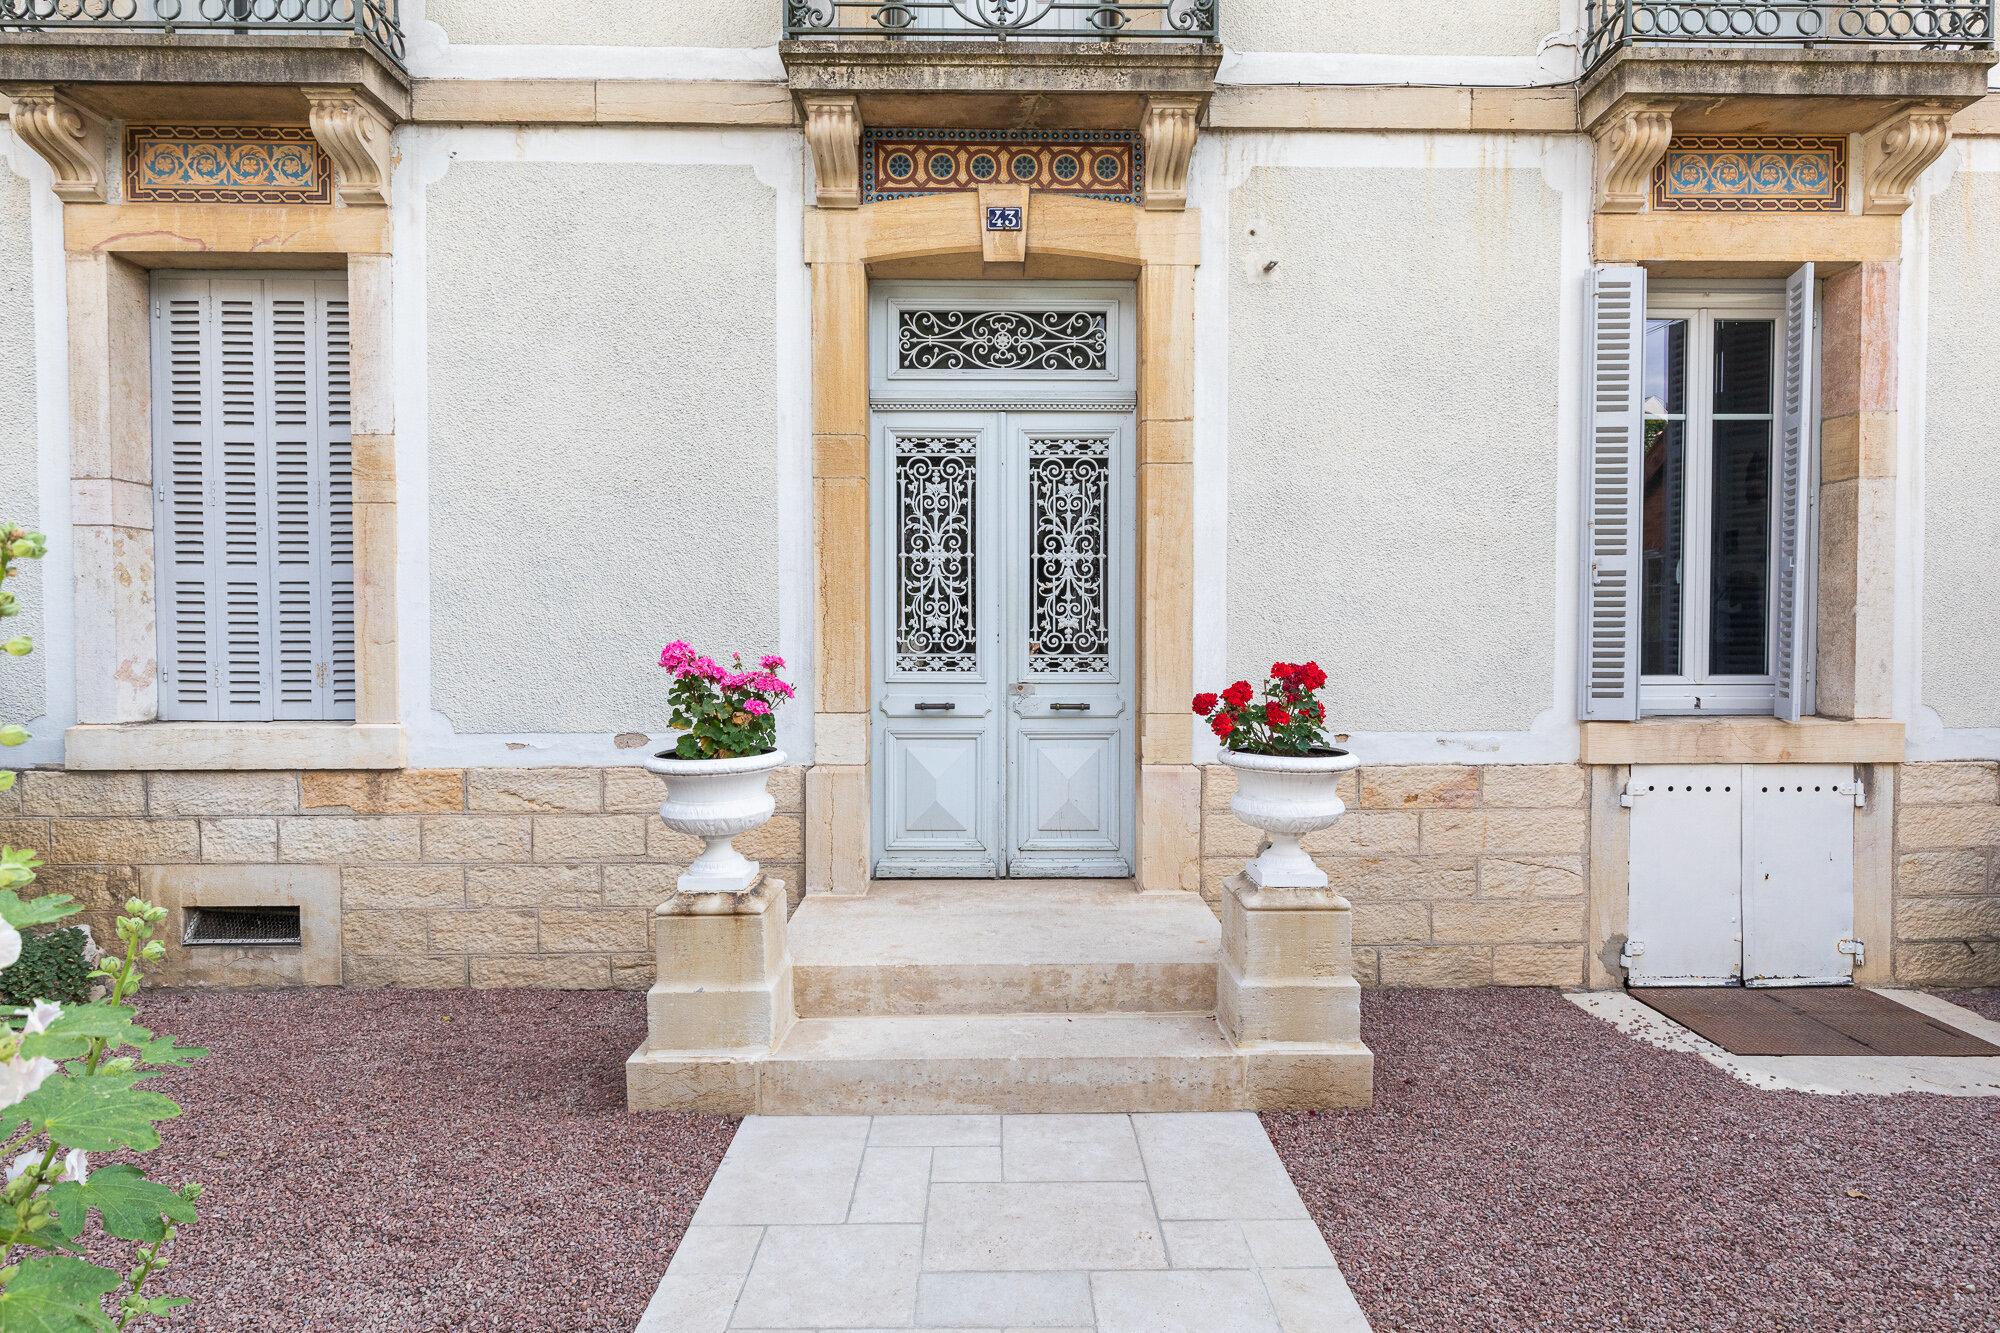 Appartement  Dijon - Victor Hugo Appartement 59 m² - 1 chambre - 1 bureau - 159 000 €